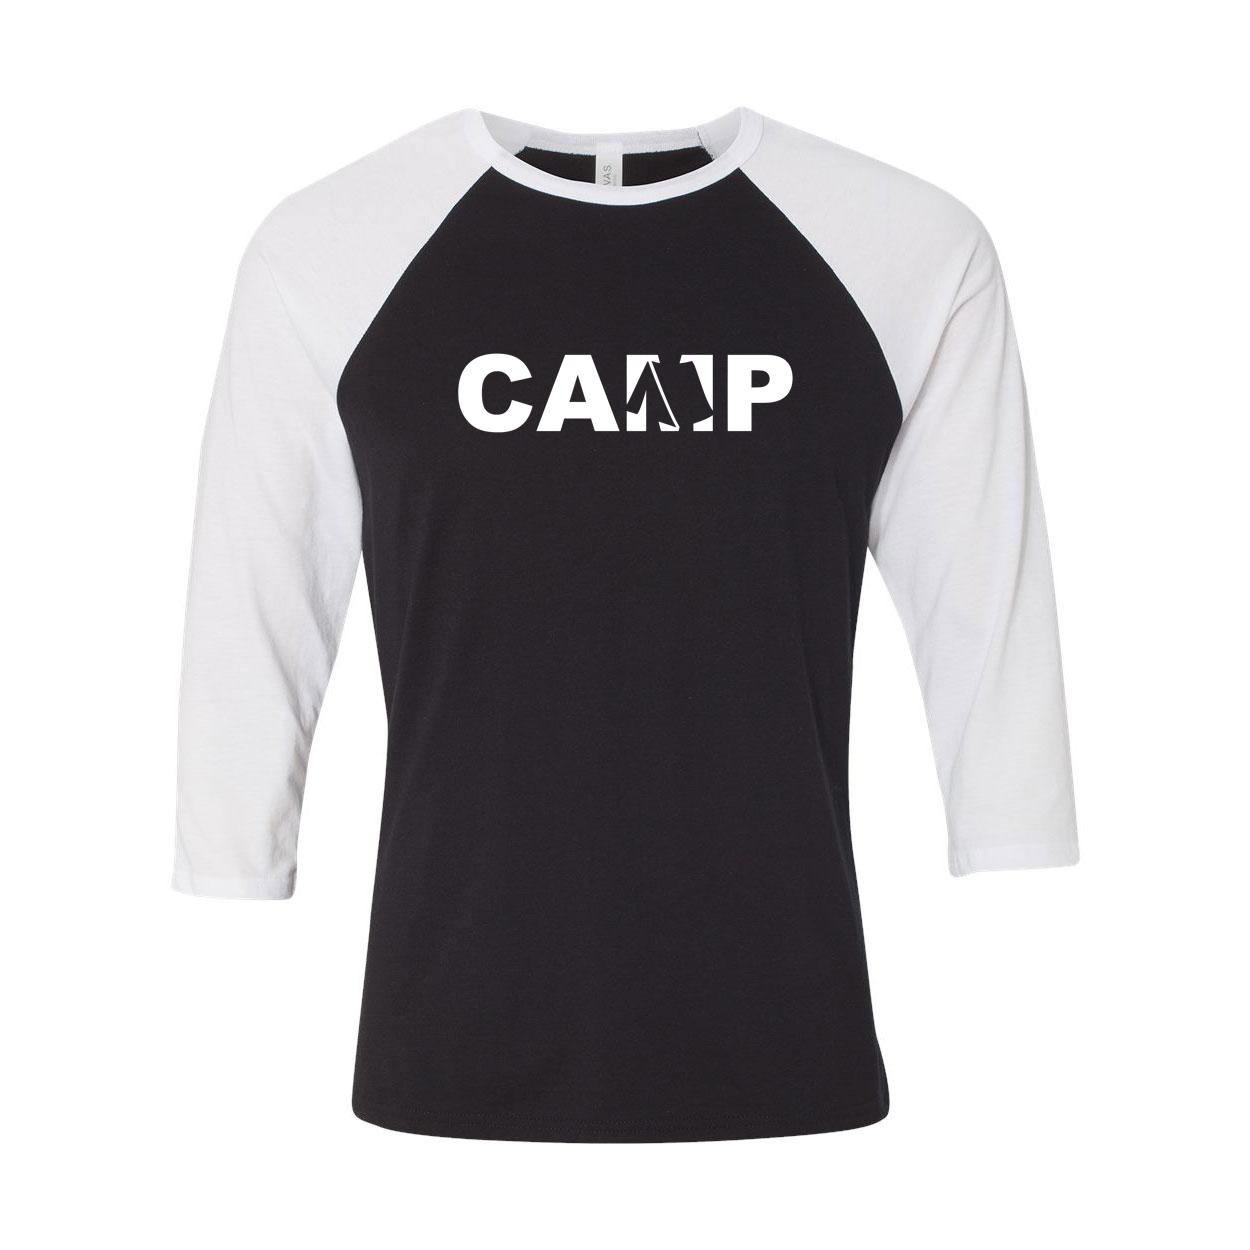 Camp Tent Logo Classic Raglan Shirt Black/White (White Logo)